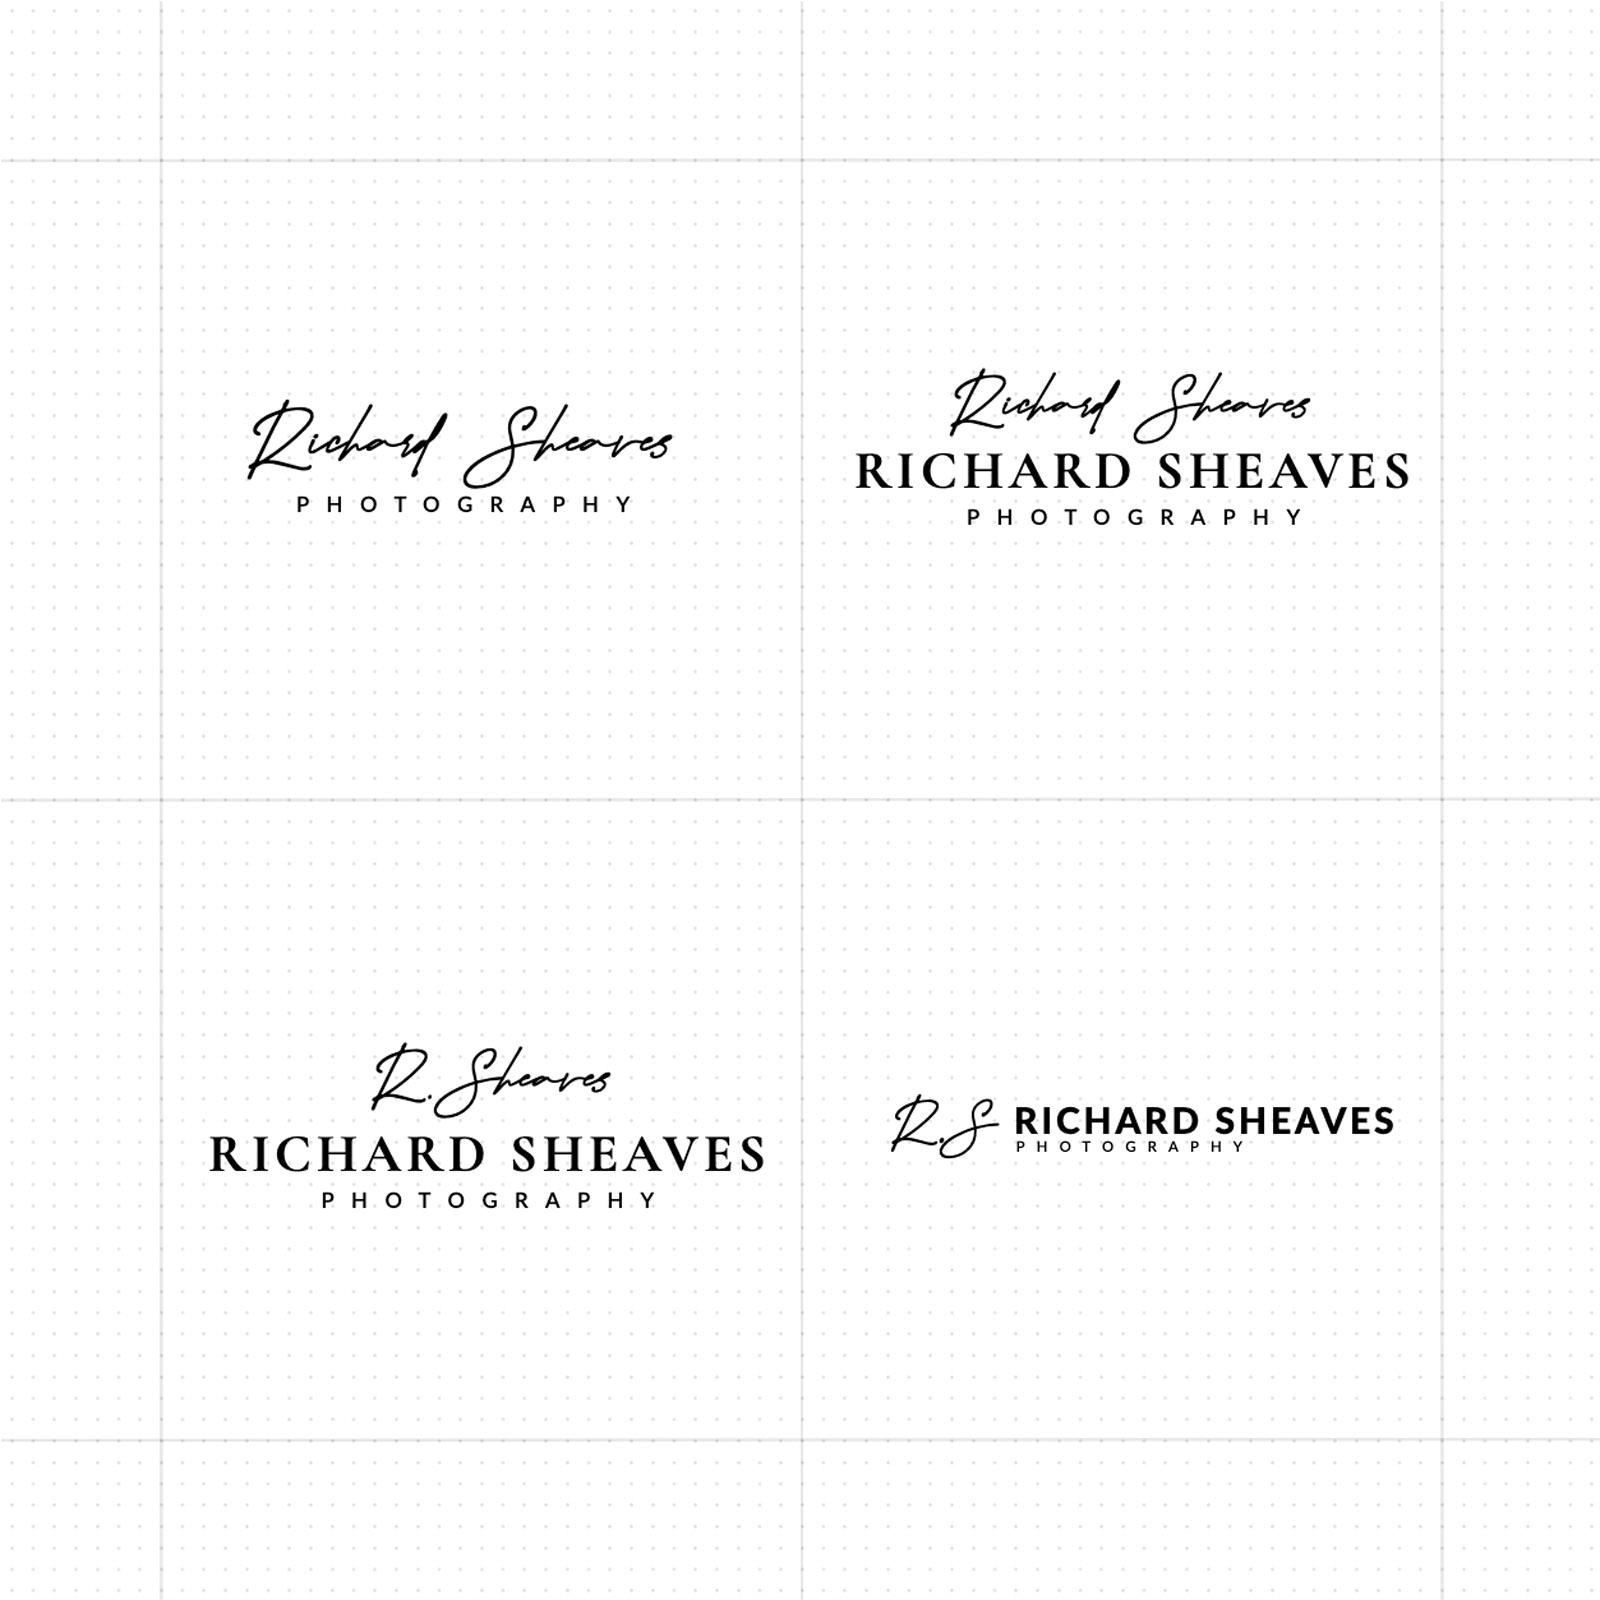 brand-identity-design-documentary-photographer-02